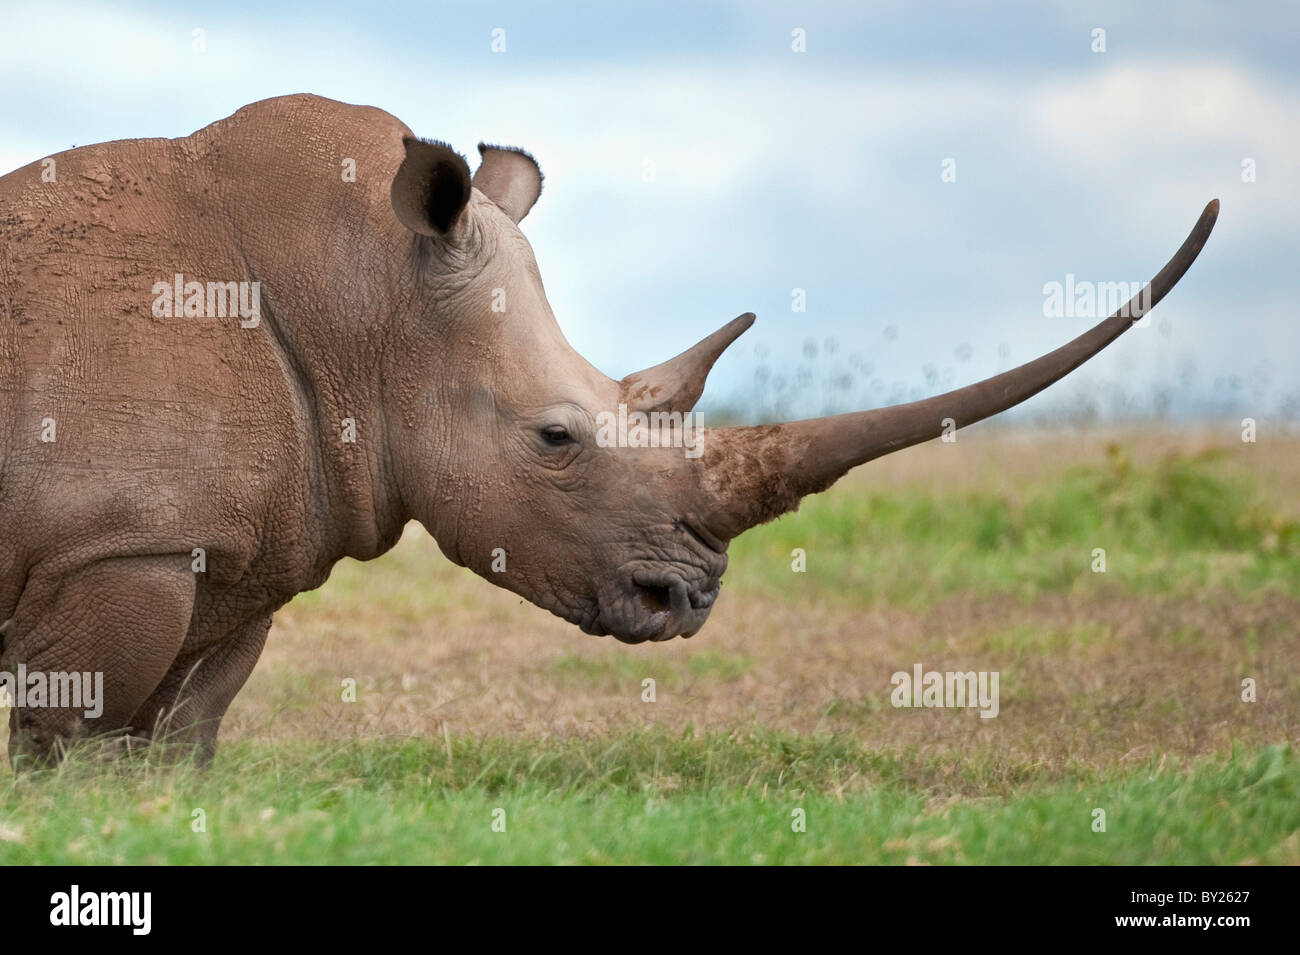 A white rhino with a very long horn. Mweiga, Solio, Kenya - Stock Image